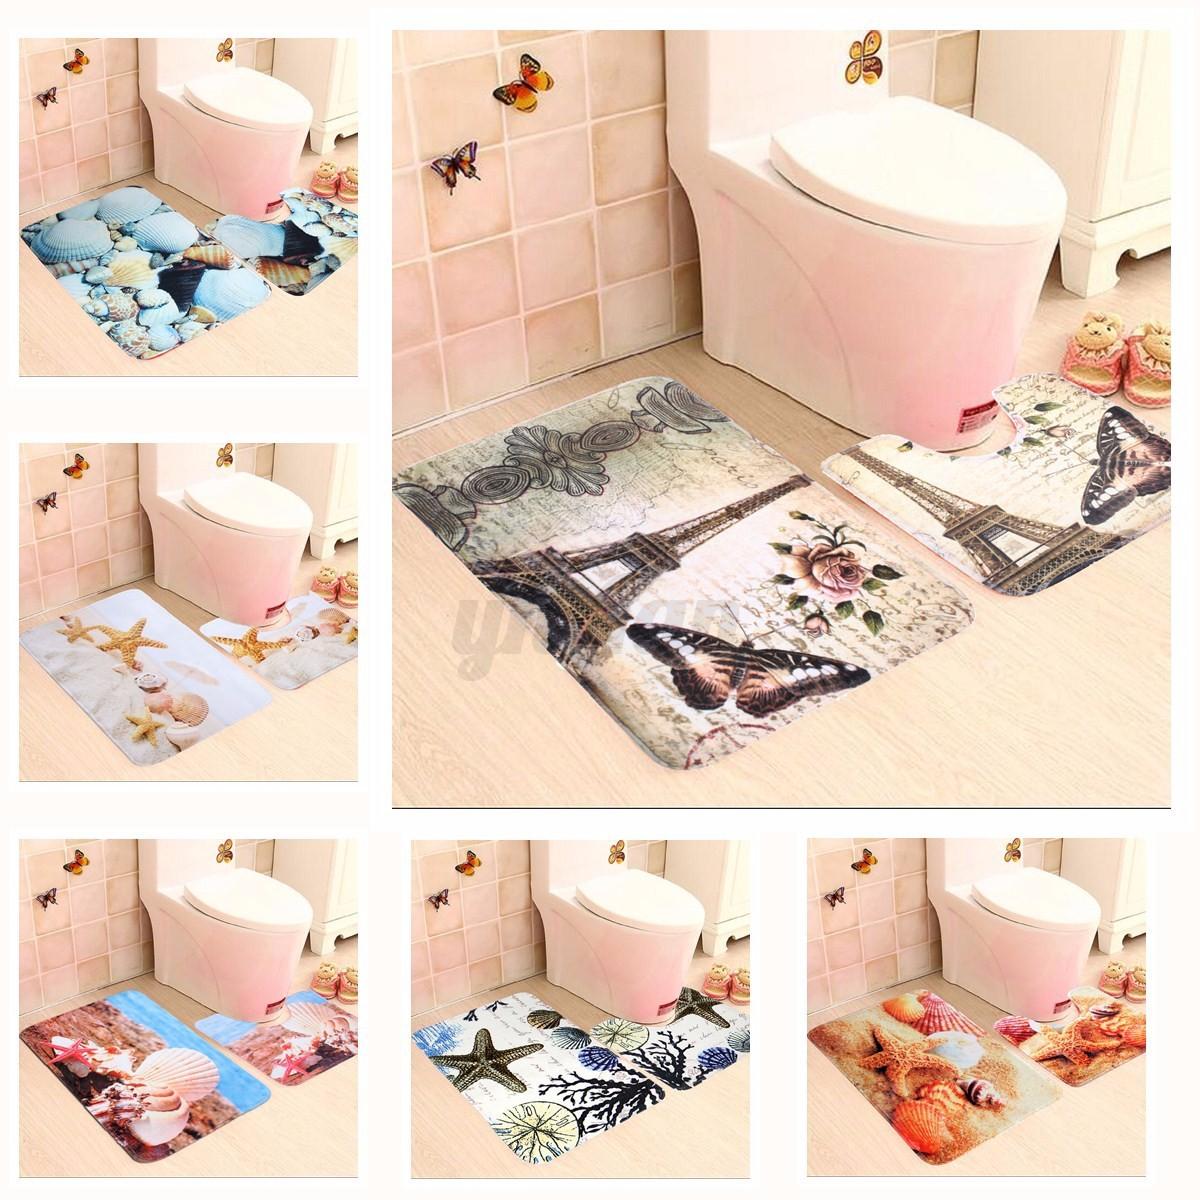 Different Types Of Bathroom Flooring: 2Pcs 6 Types Floor Bath Mat Set Anti-slip Bathroom Carpet